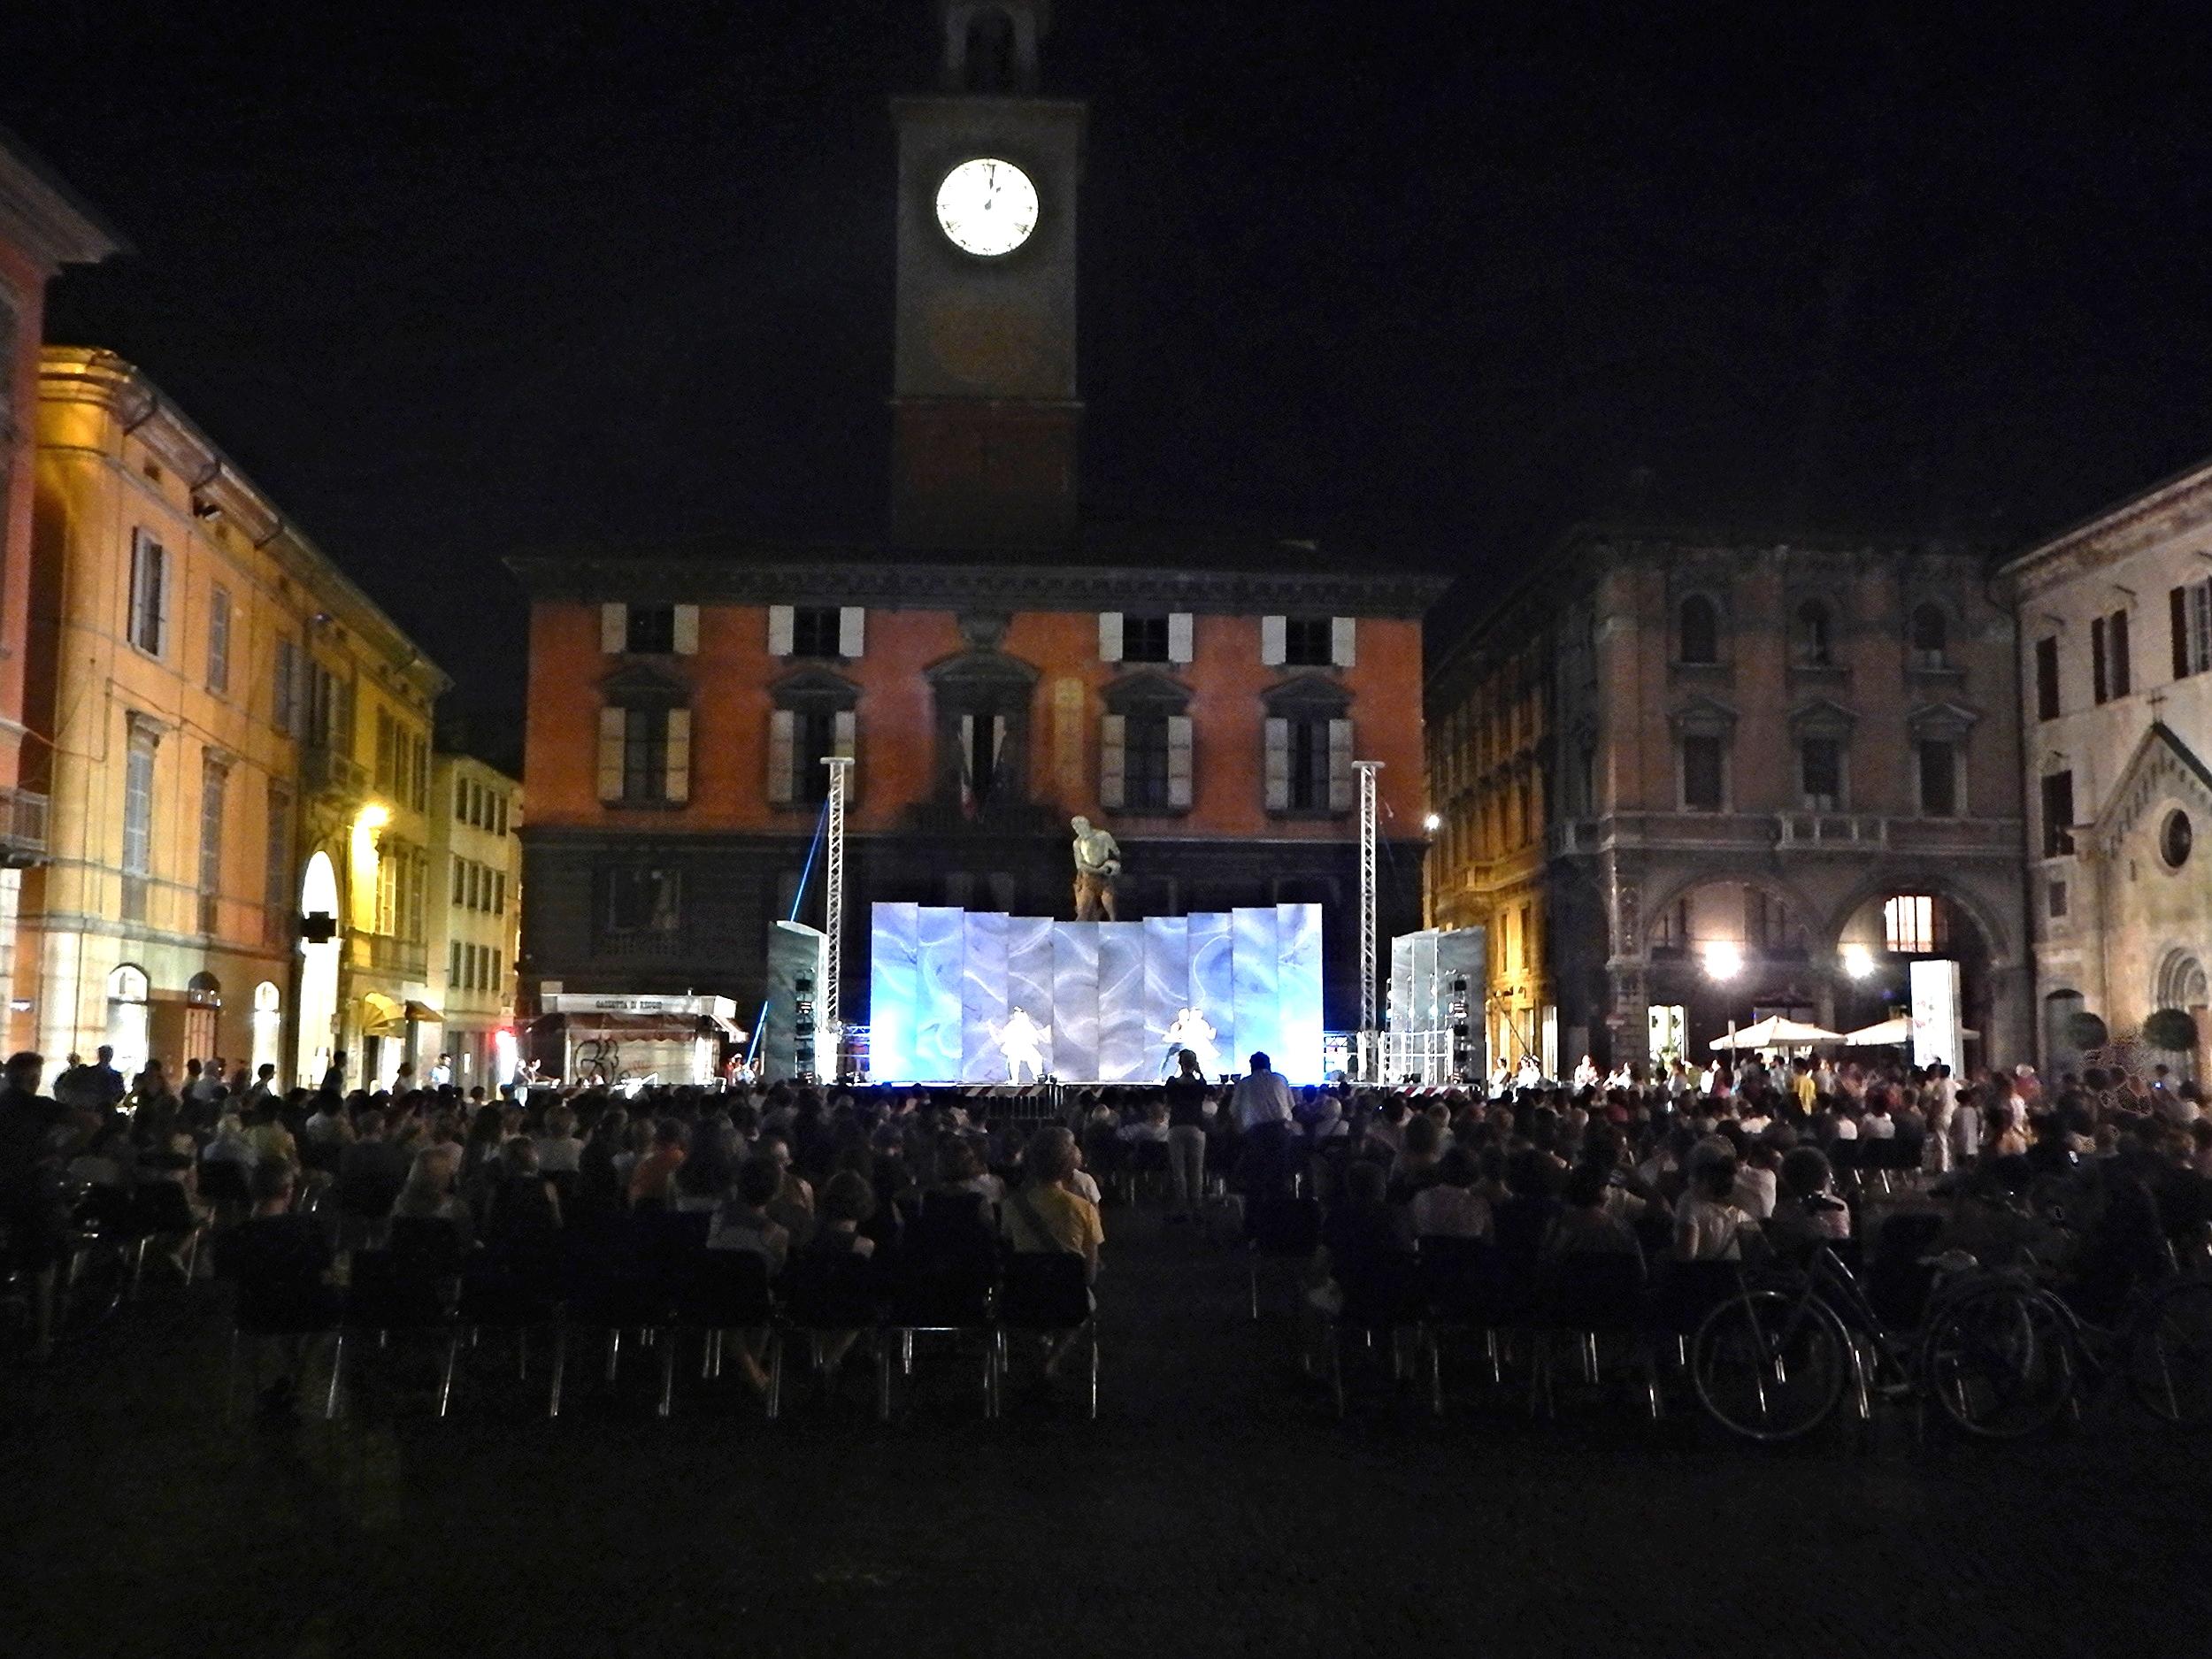 Ballet in Piazza Camillo Prampolini